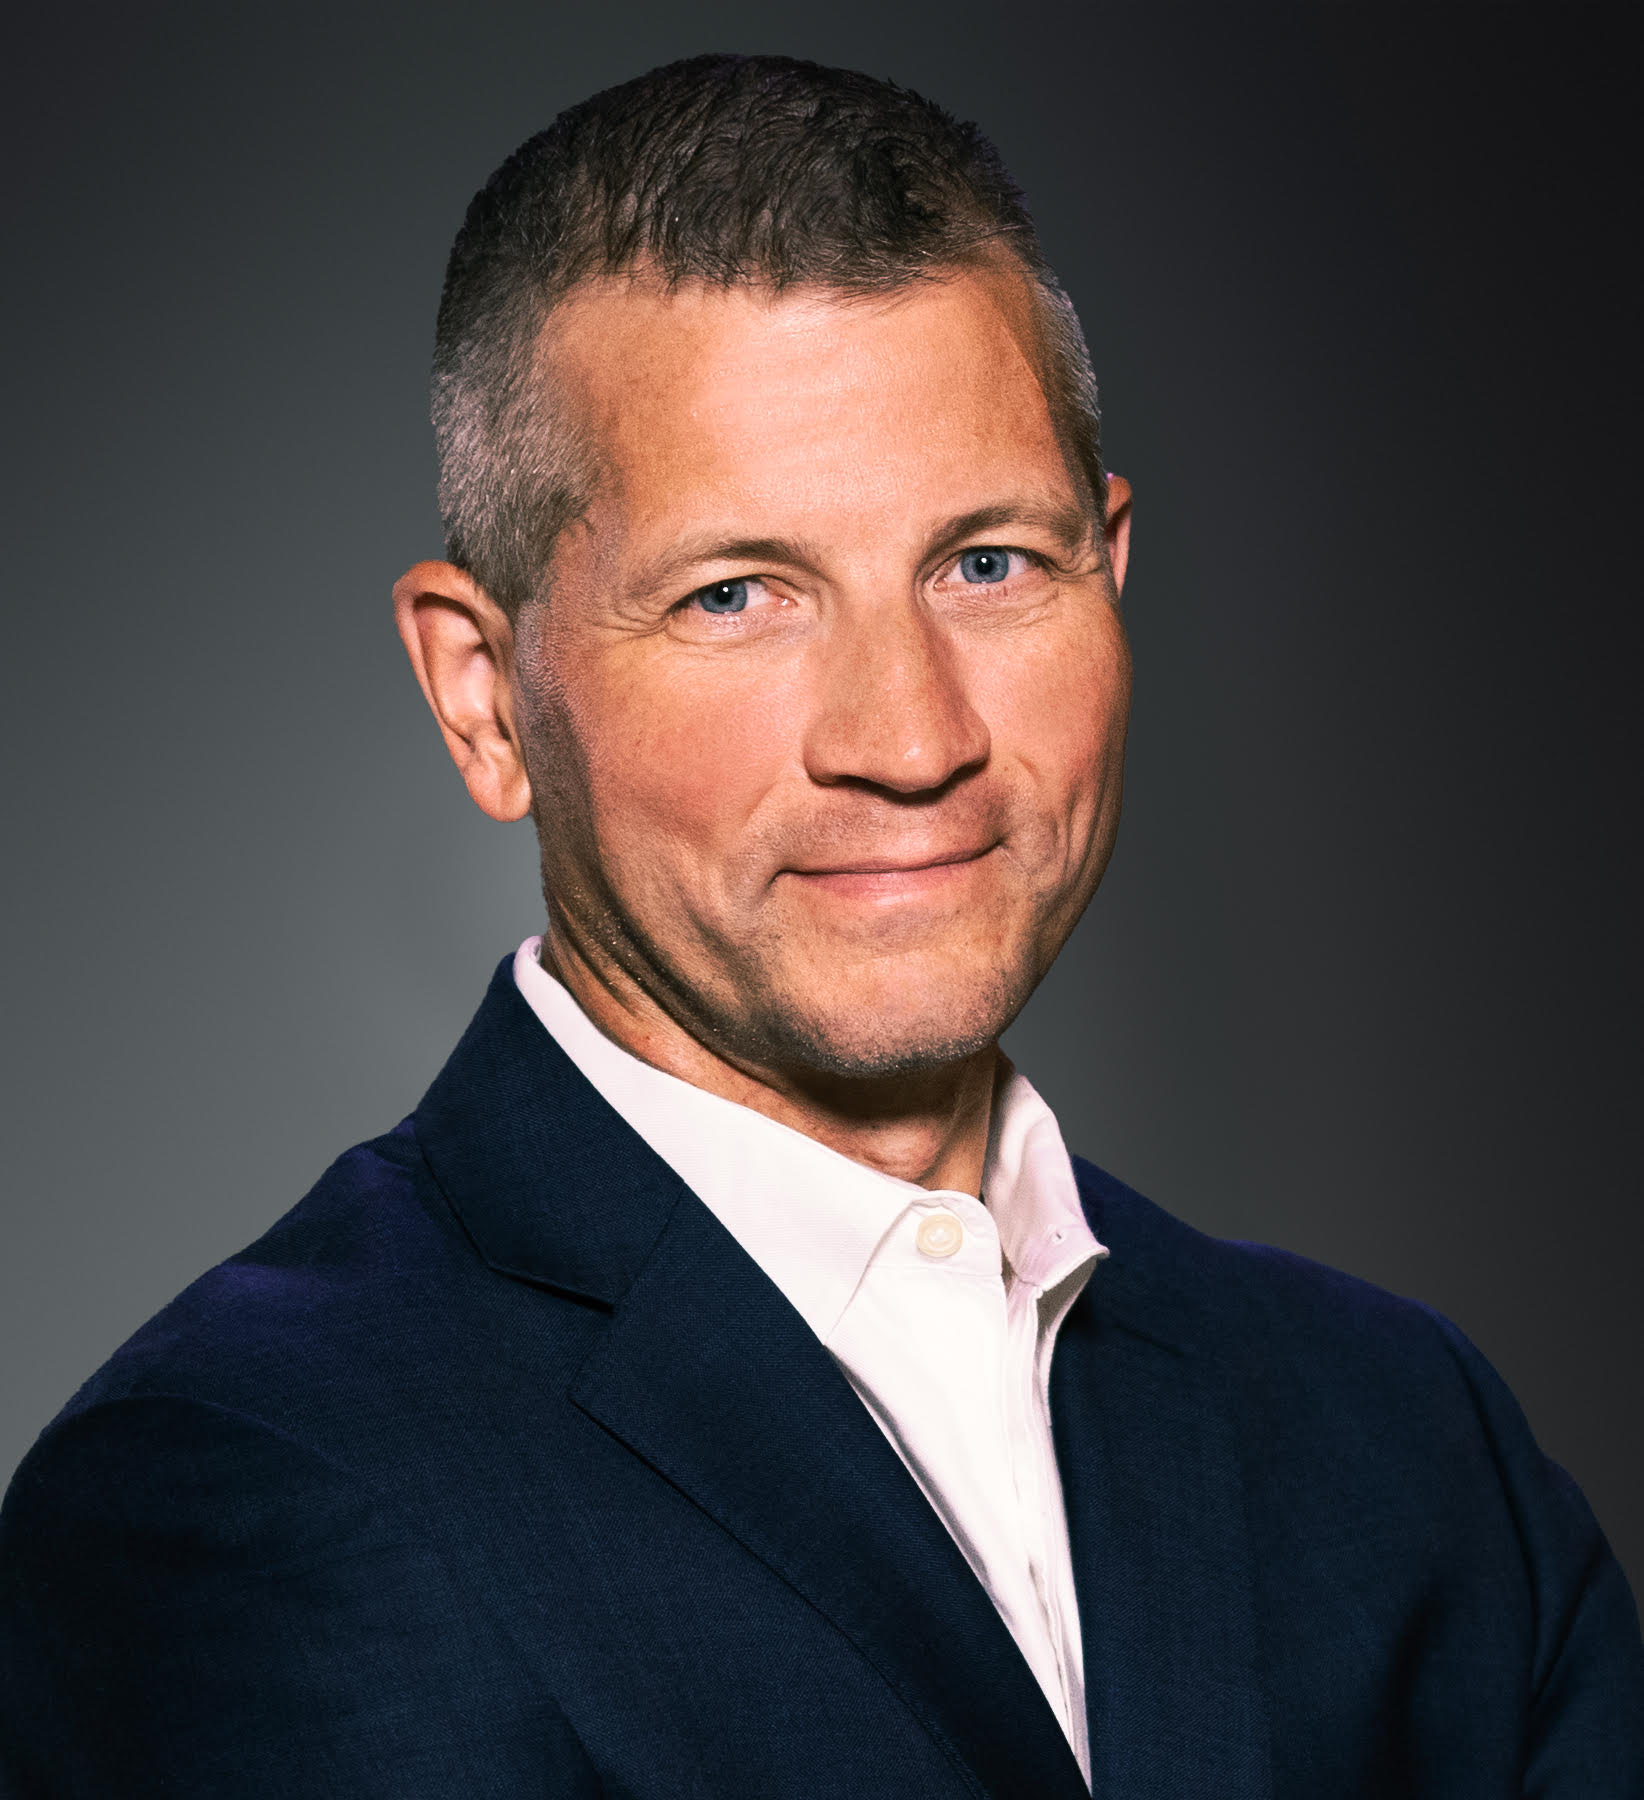 Manfred Kanther Headshot | Dakota Investments